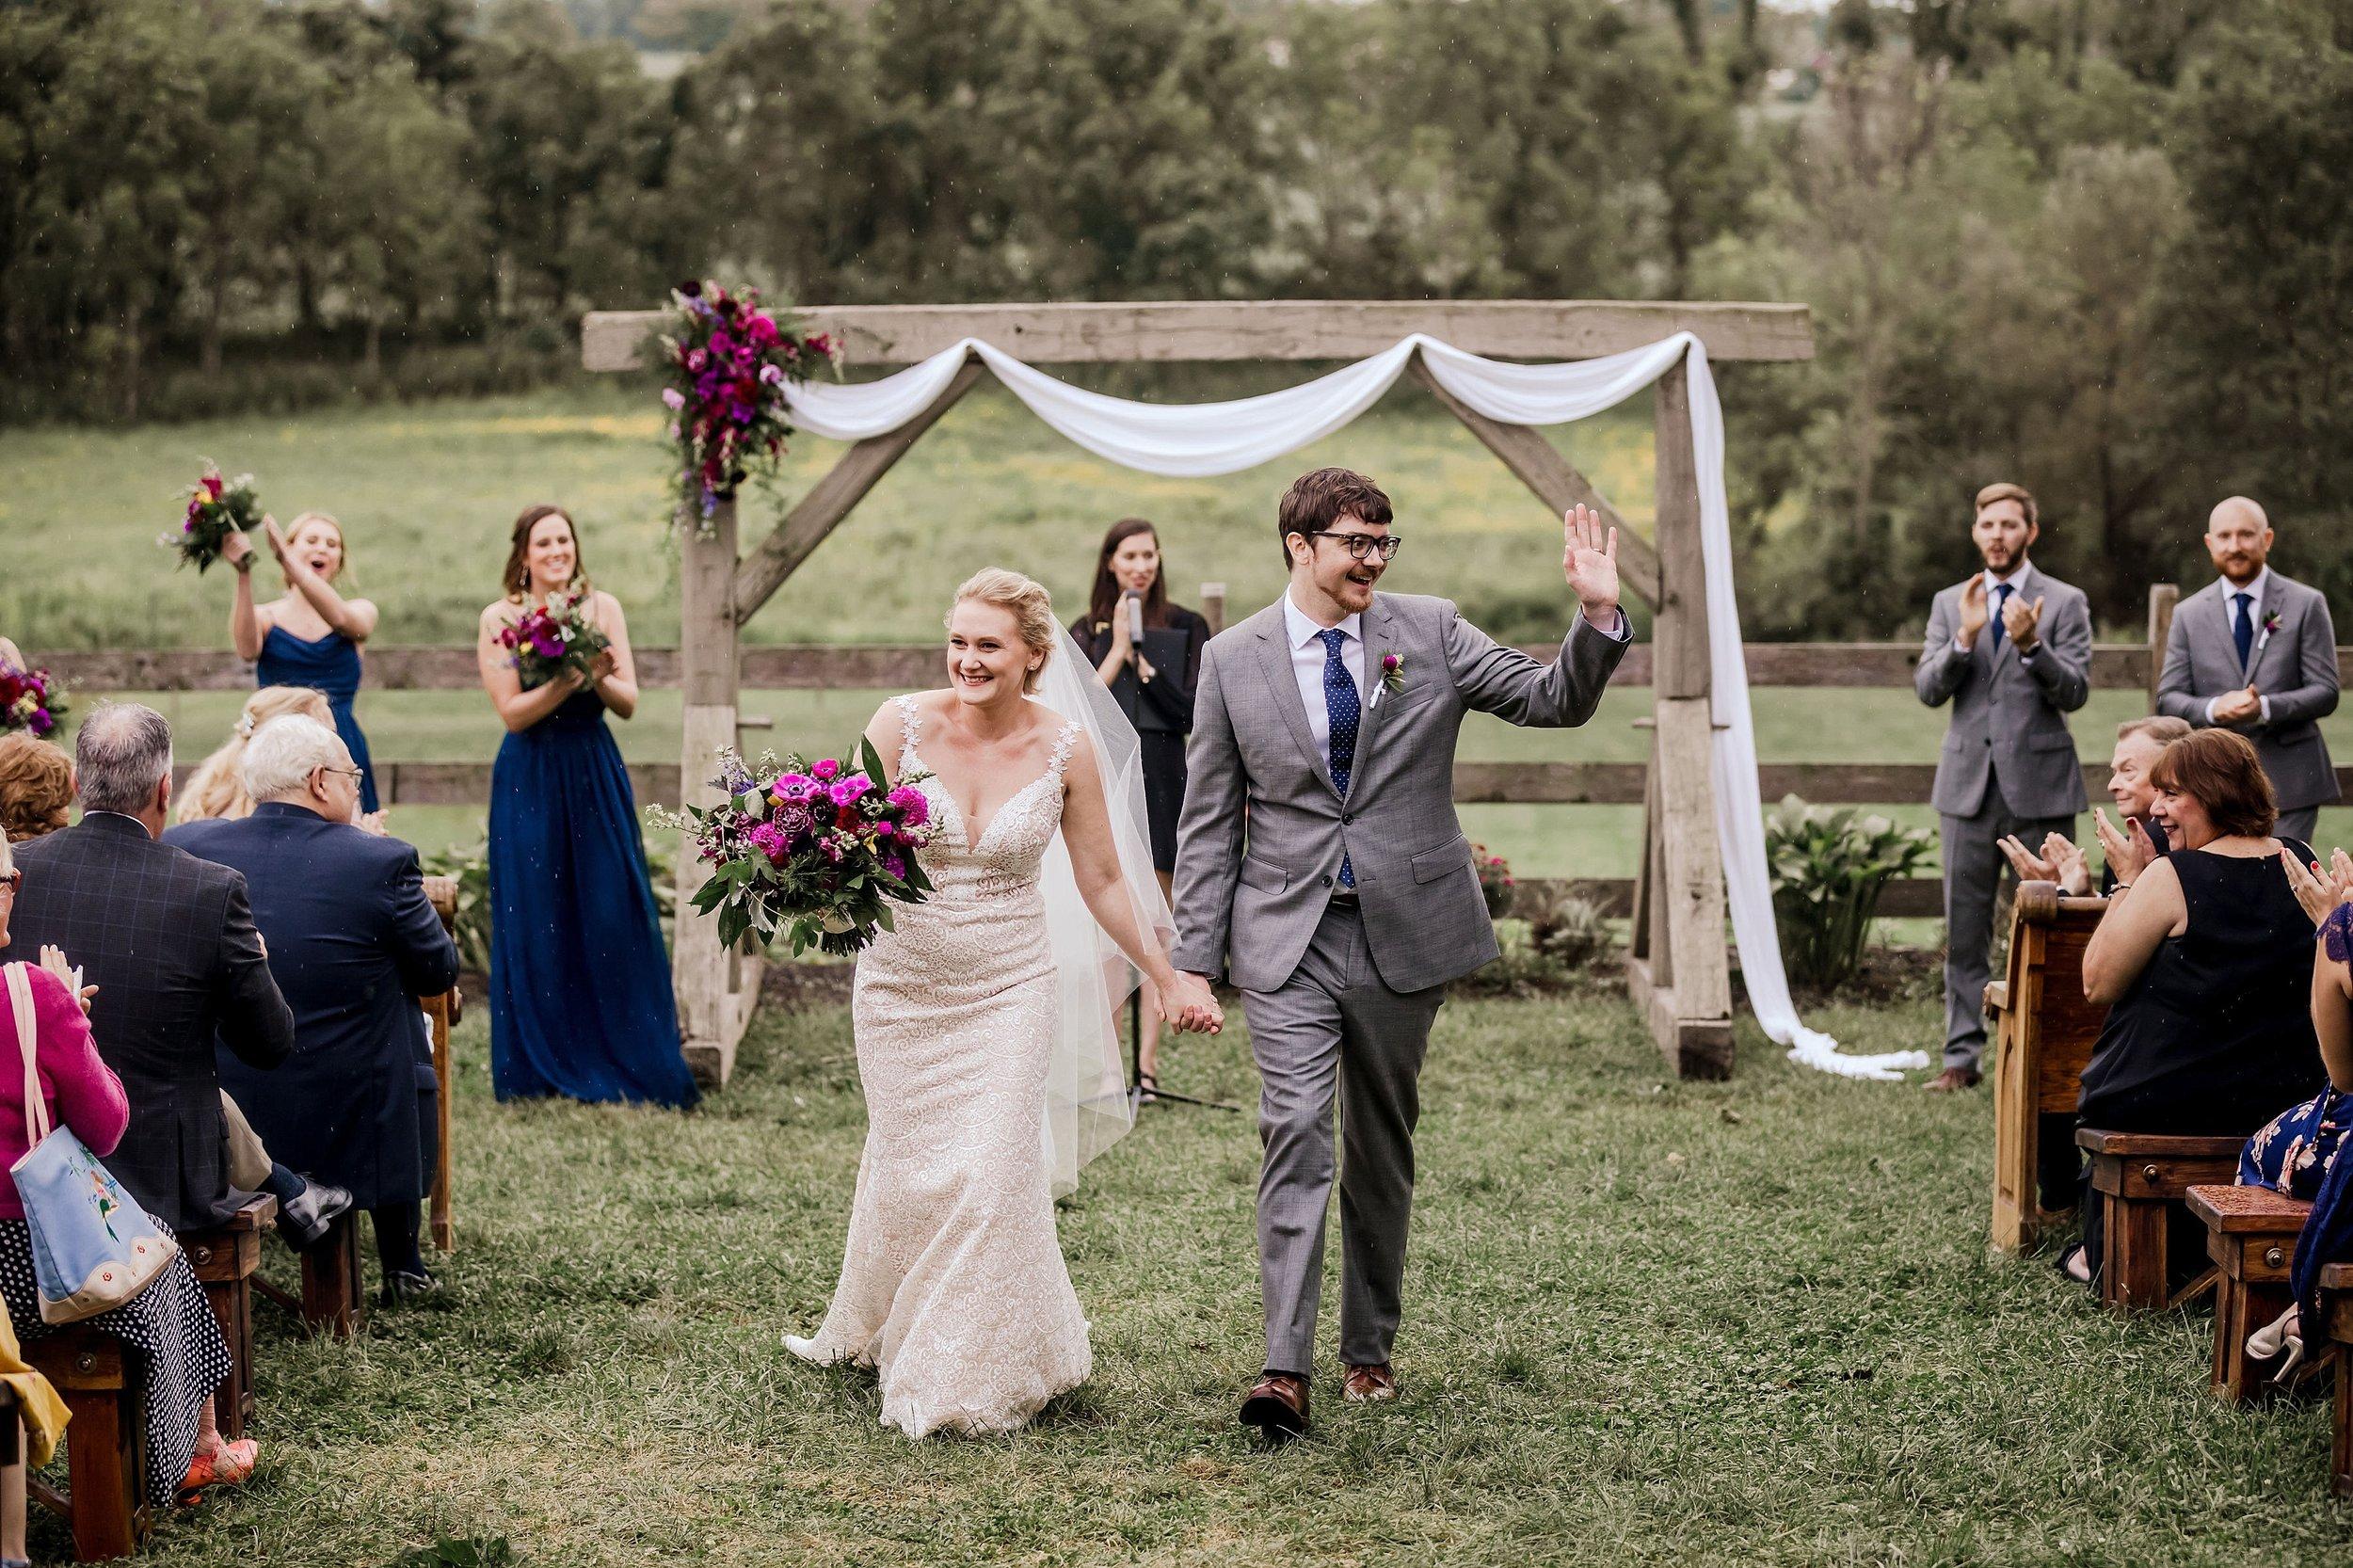 Durham-Hill-Farm-Wedding-Photographer_0006.jpg